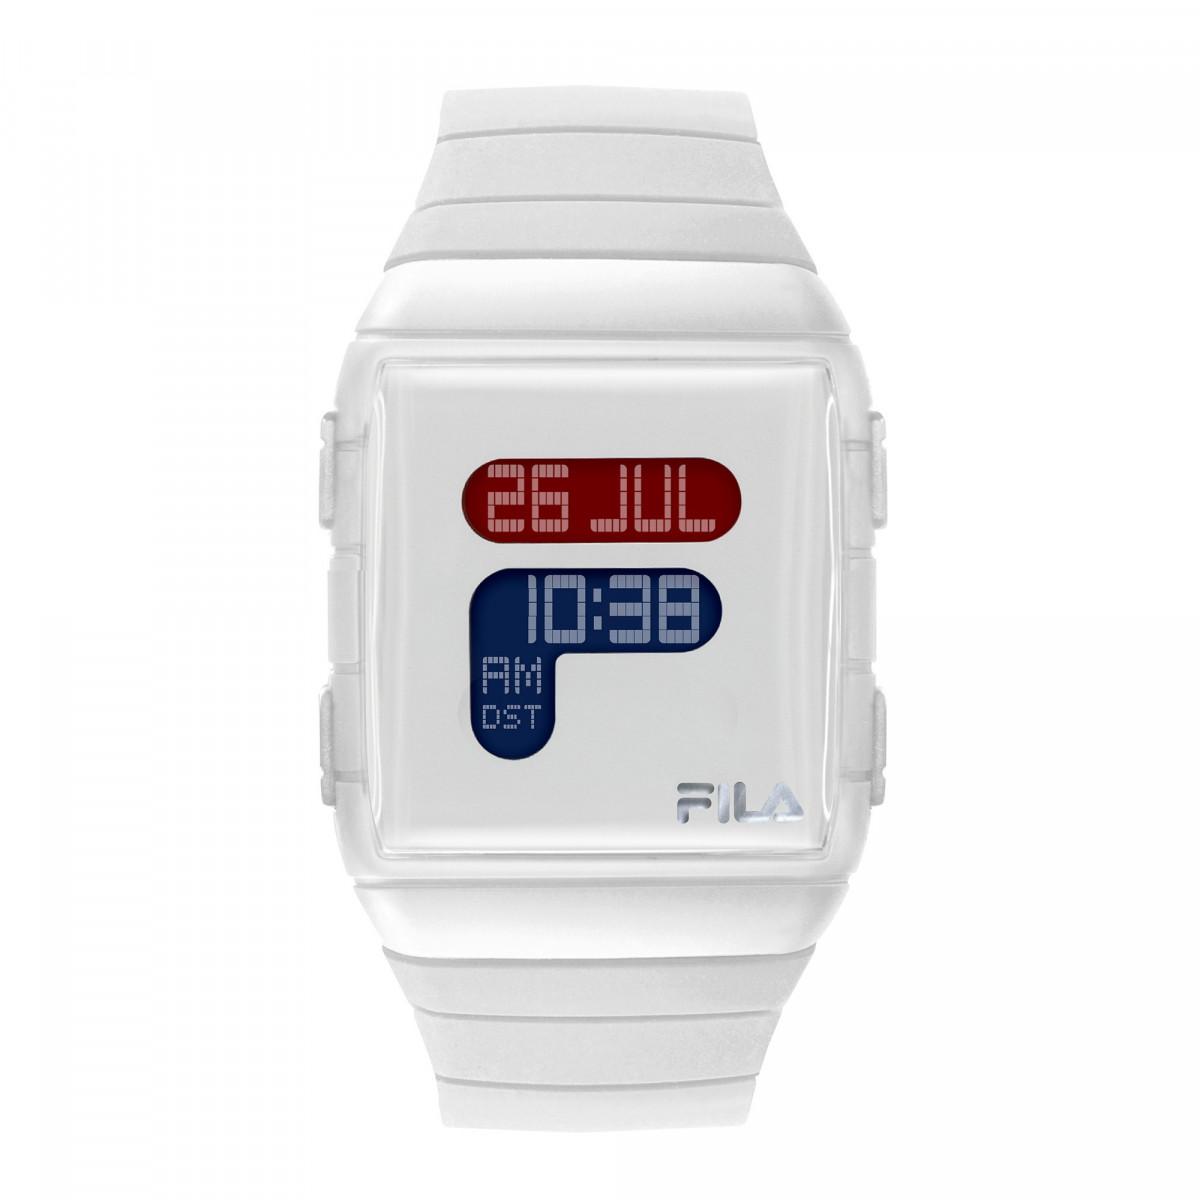 Montre mixte FILA digital cadran blanc - 38-105-001